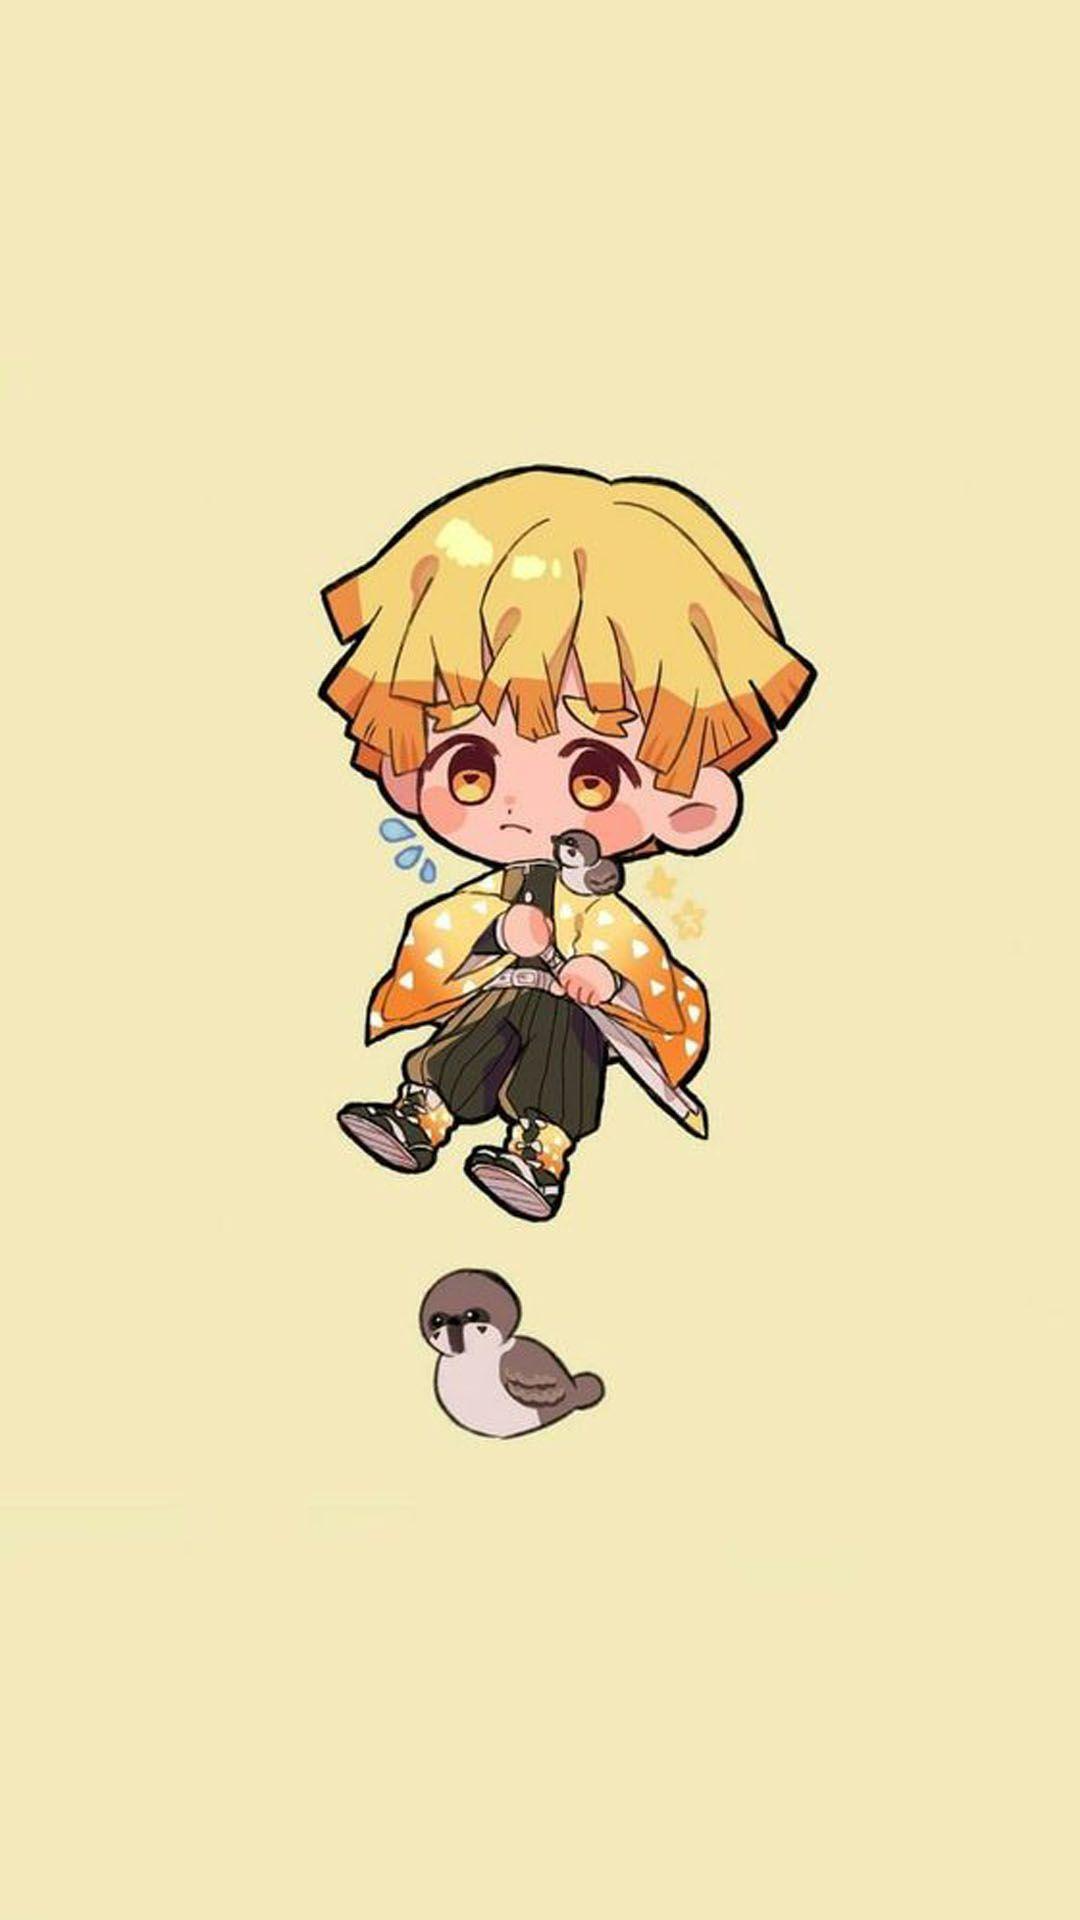 Agatsuma Zenitsu Mobile Wallpaper In 2020 Anime Wallpaper Anime Chibi Cute Anime Wallpaper